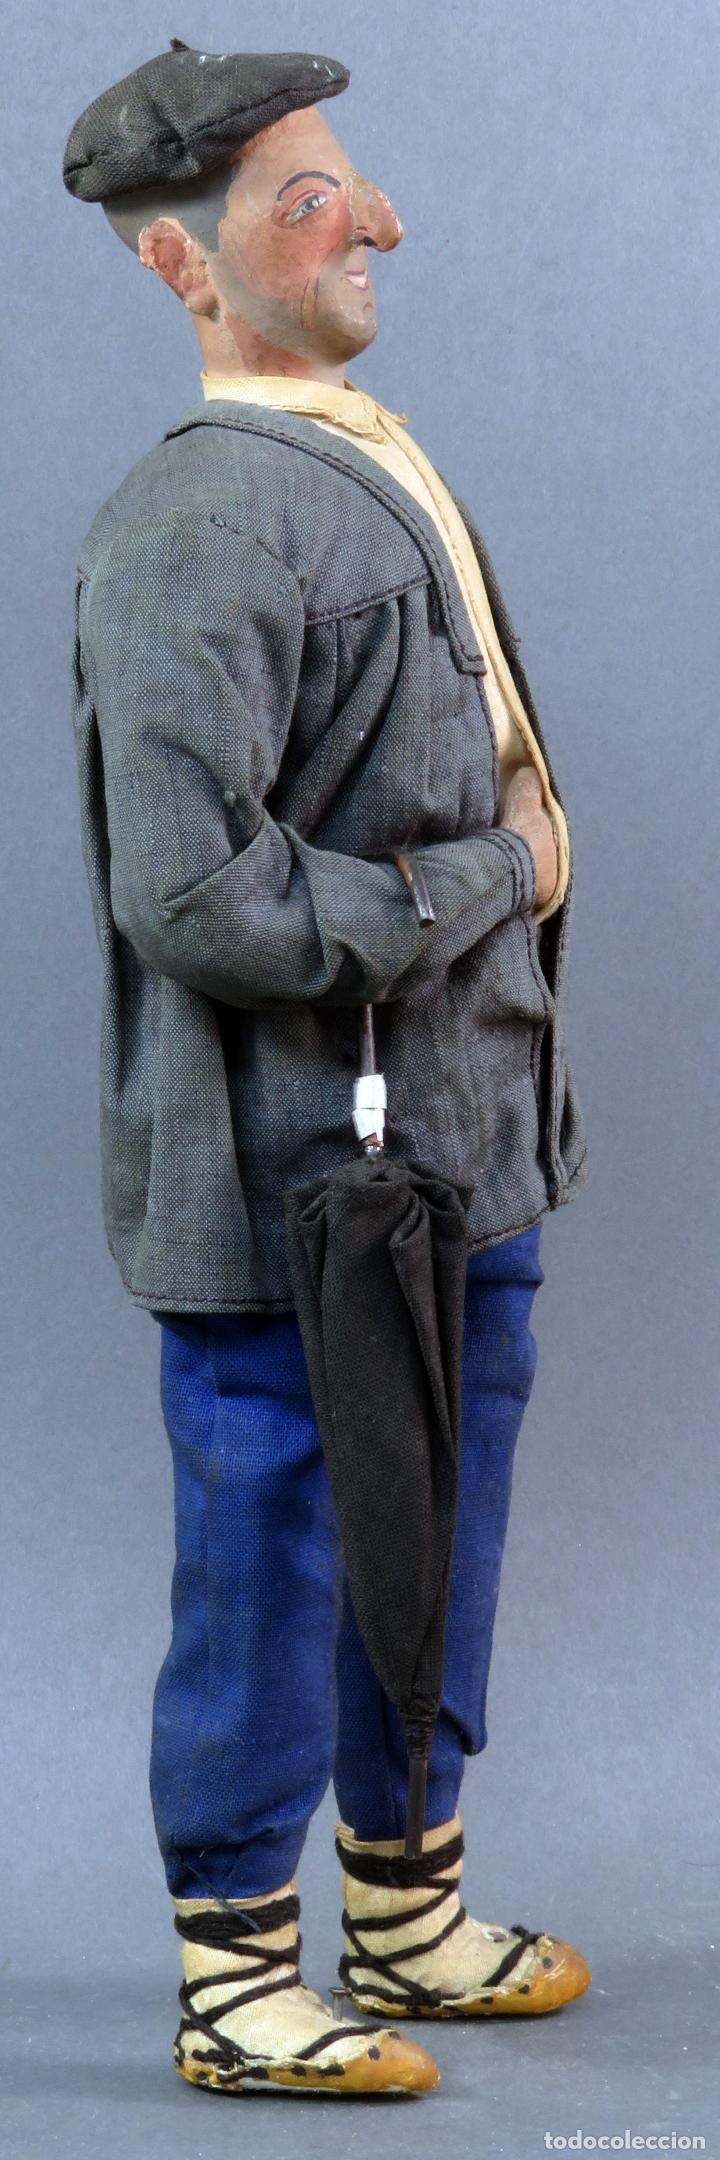 Muñeca española clasica: Paisano vasco boina paraguas cartón piedra piel y trapo años 30 30 cm alto - Foto 3 - 125831975